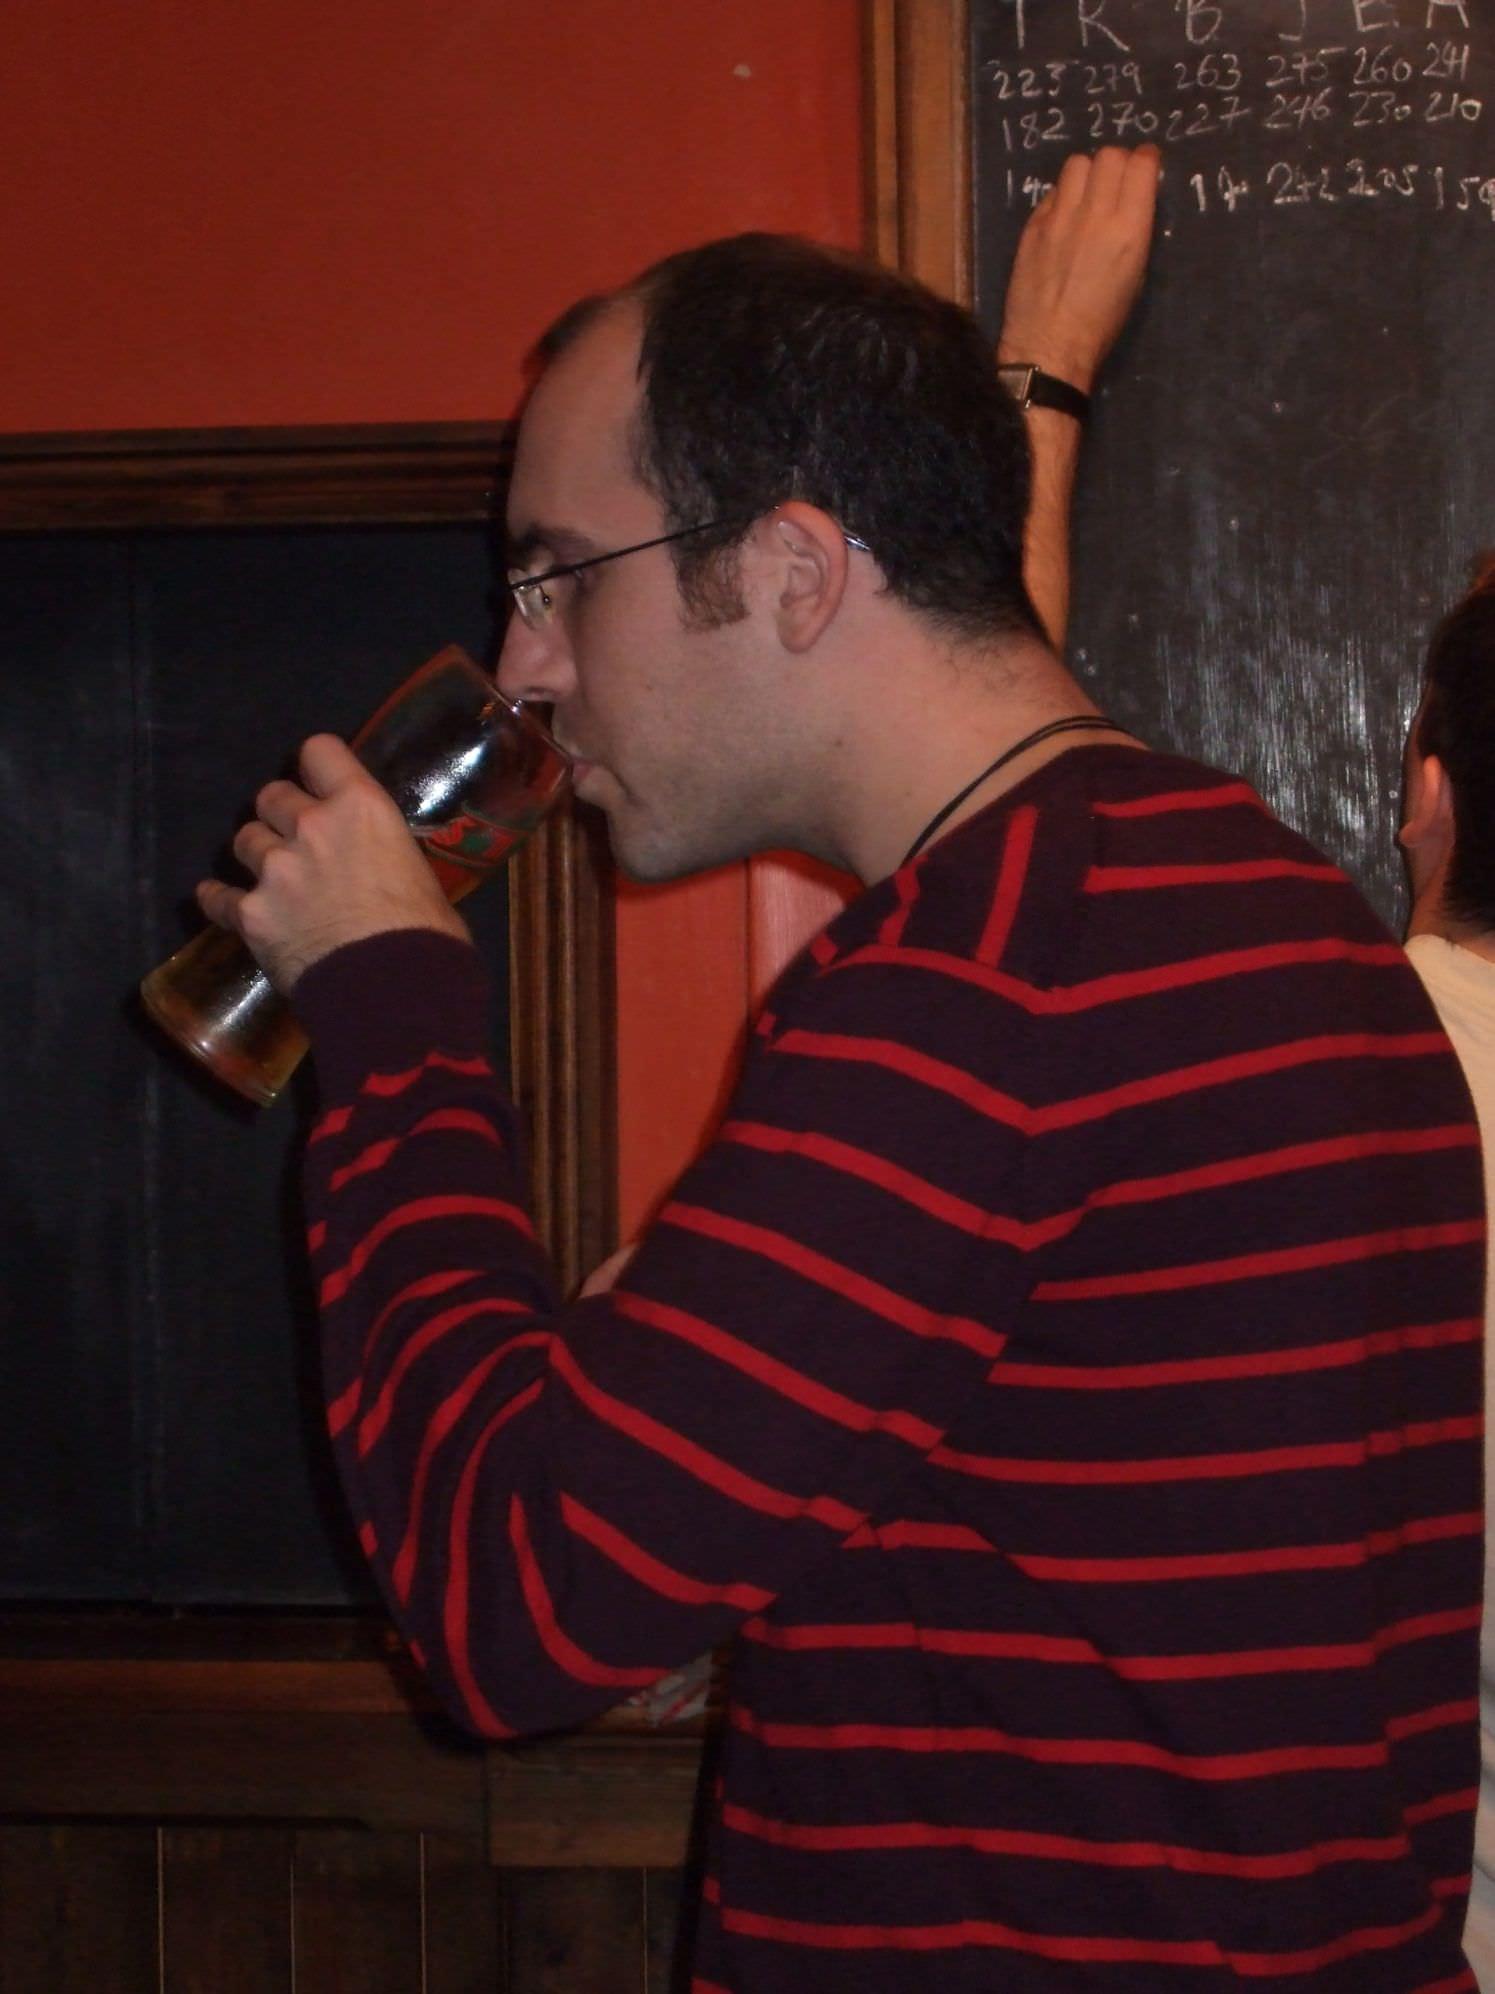 081FPC2007